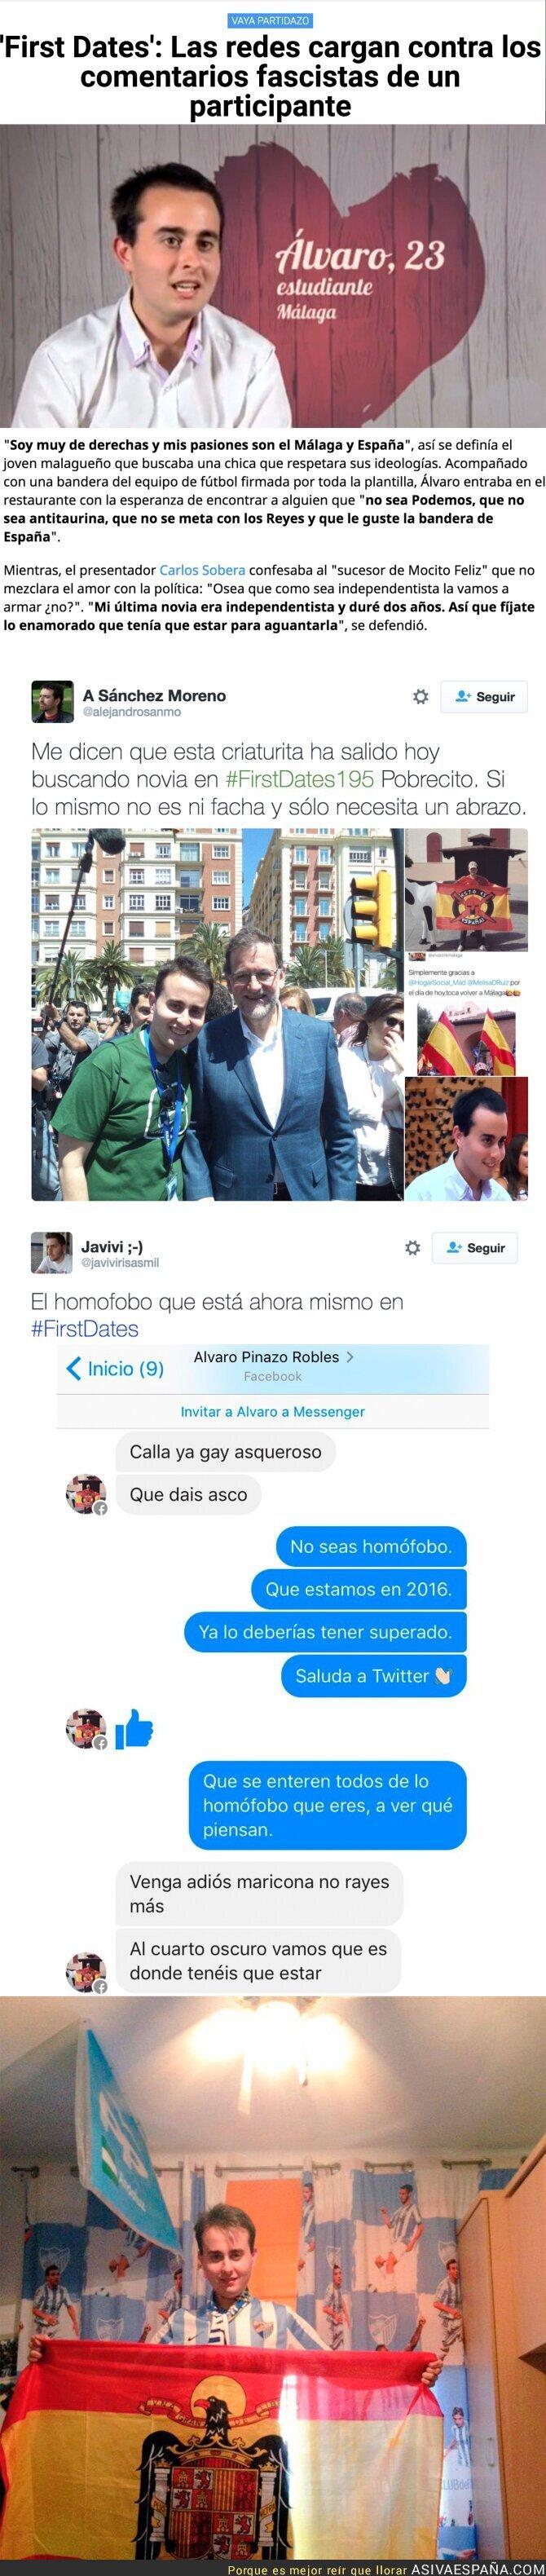 58298 - Llevan a 'First Dates' a un homófobo y fascista para encontrar pareja e internet explota en críticas